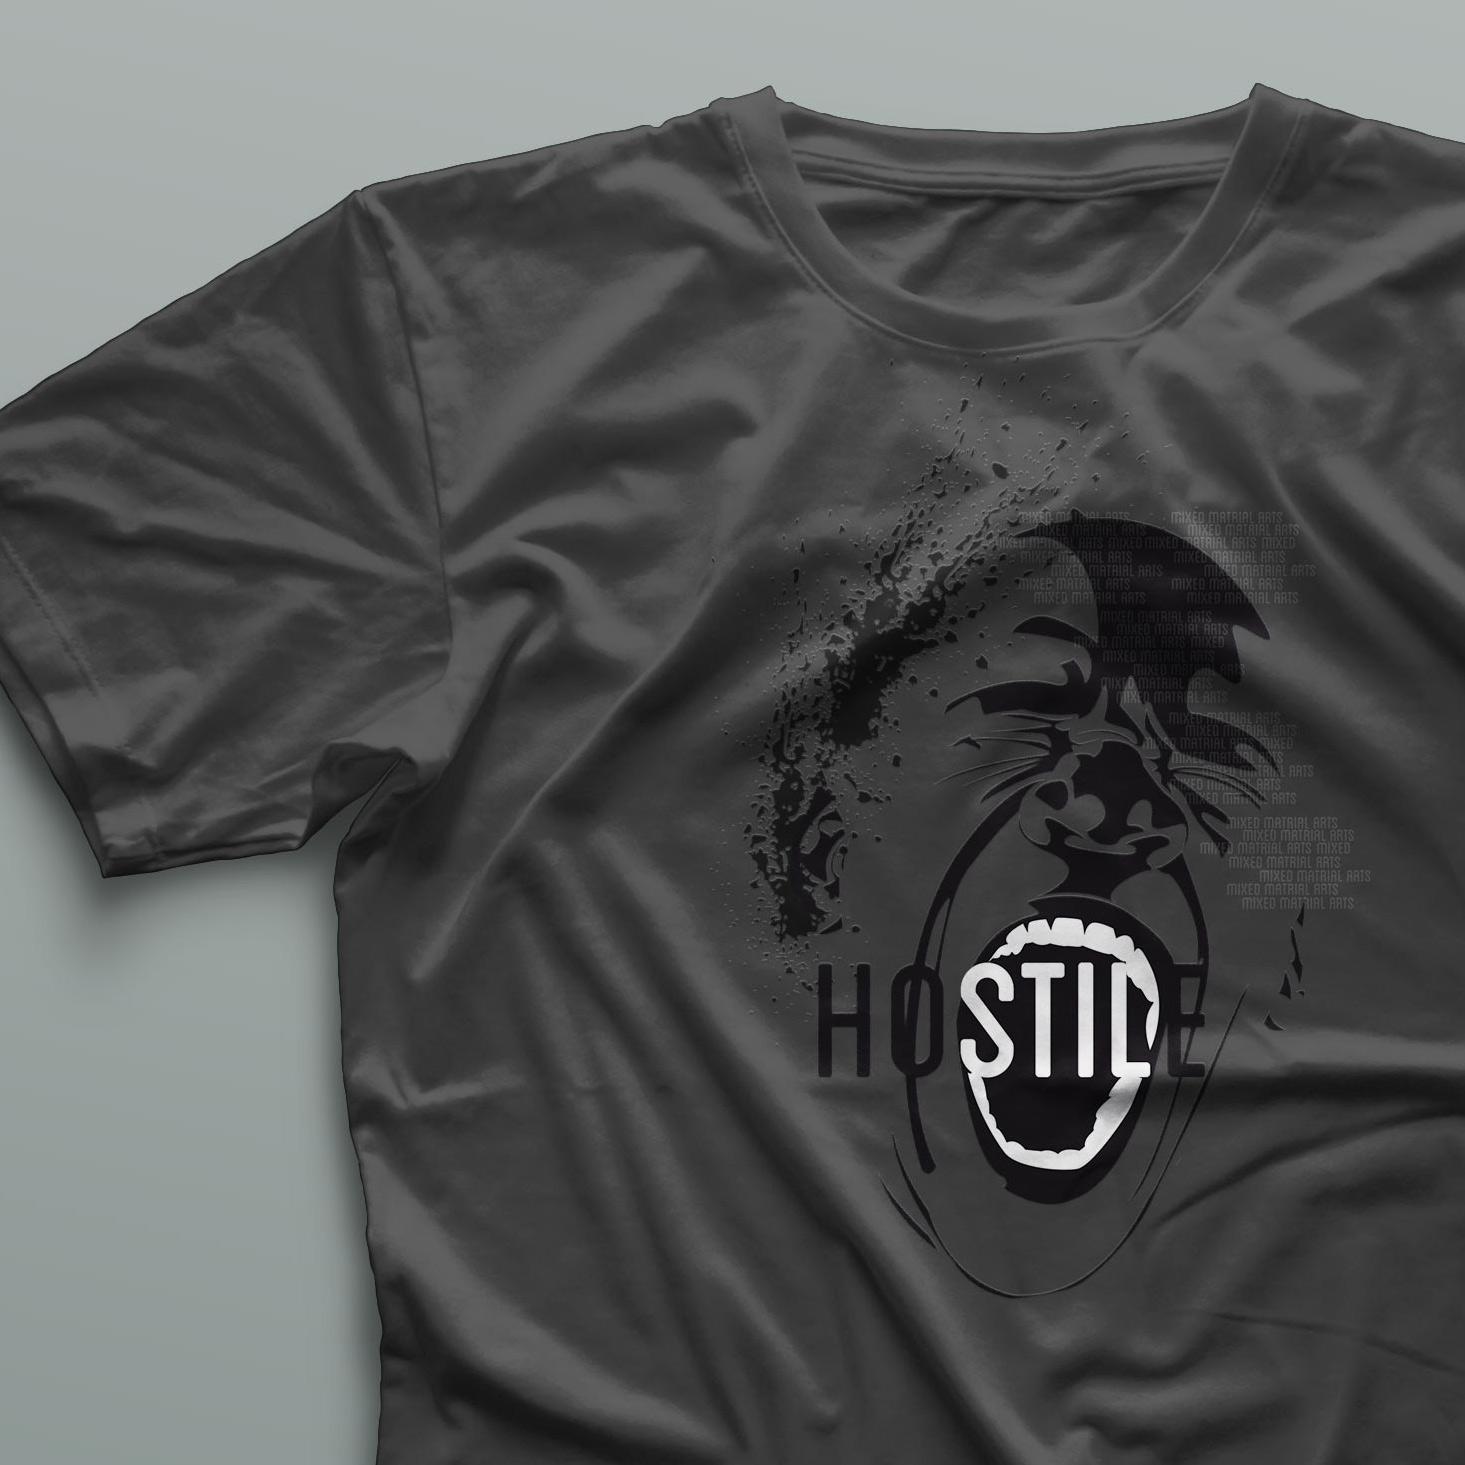 Diseño de camiseta Hostile